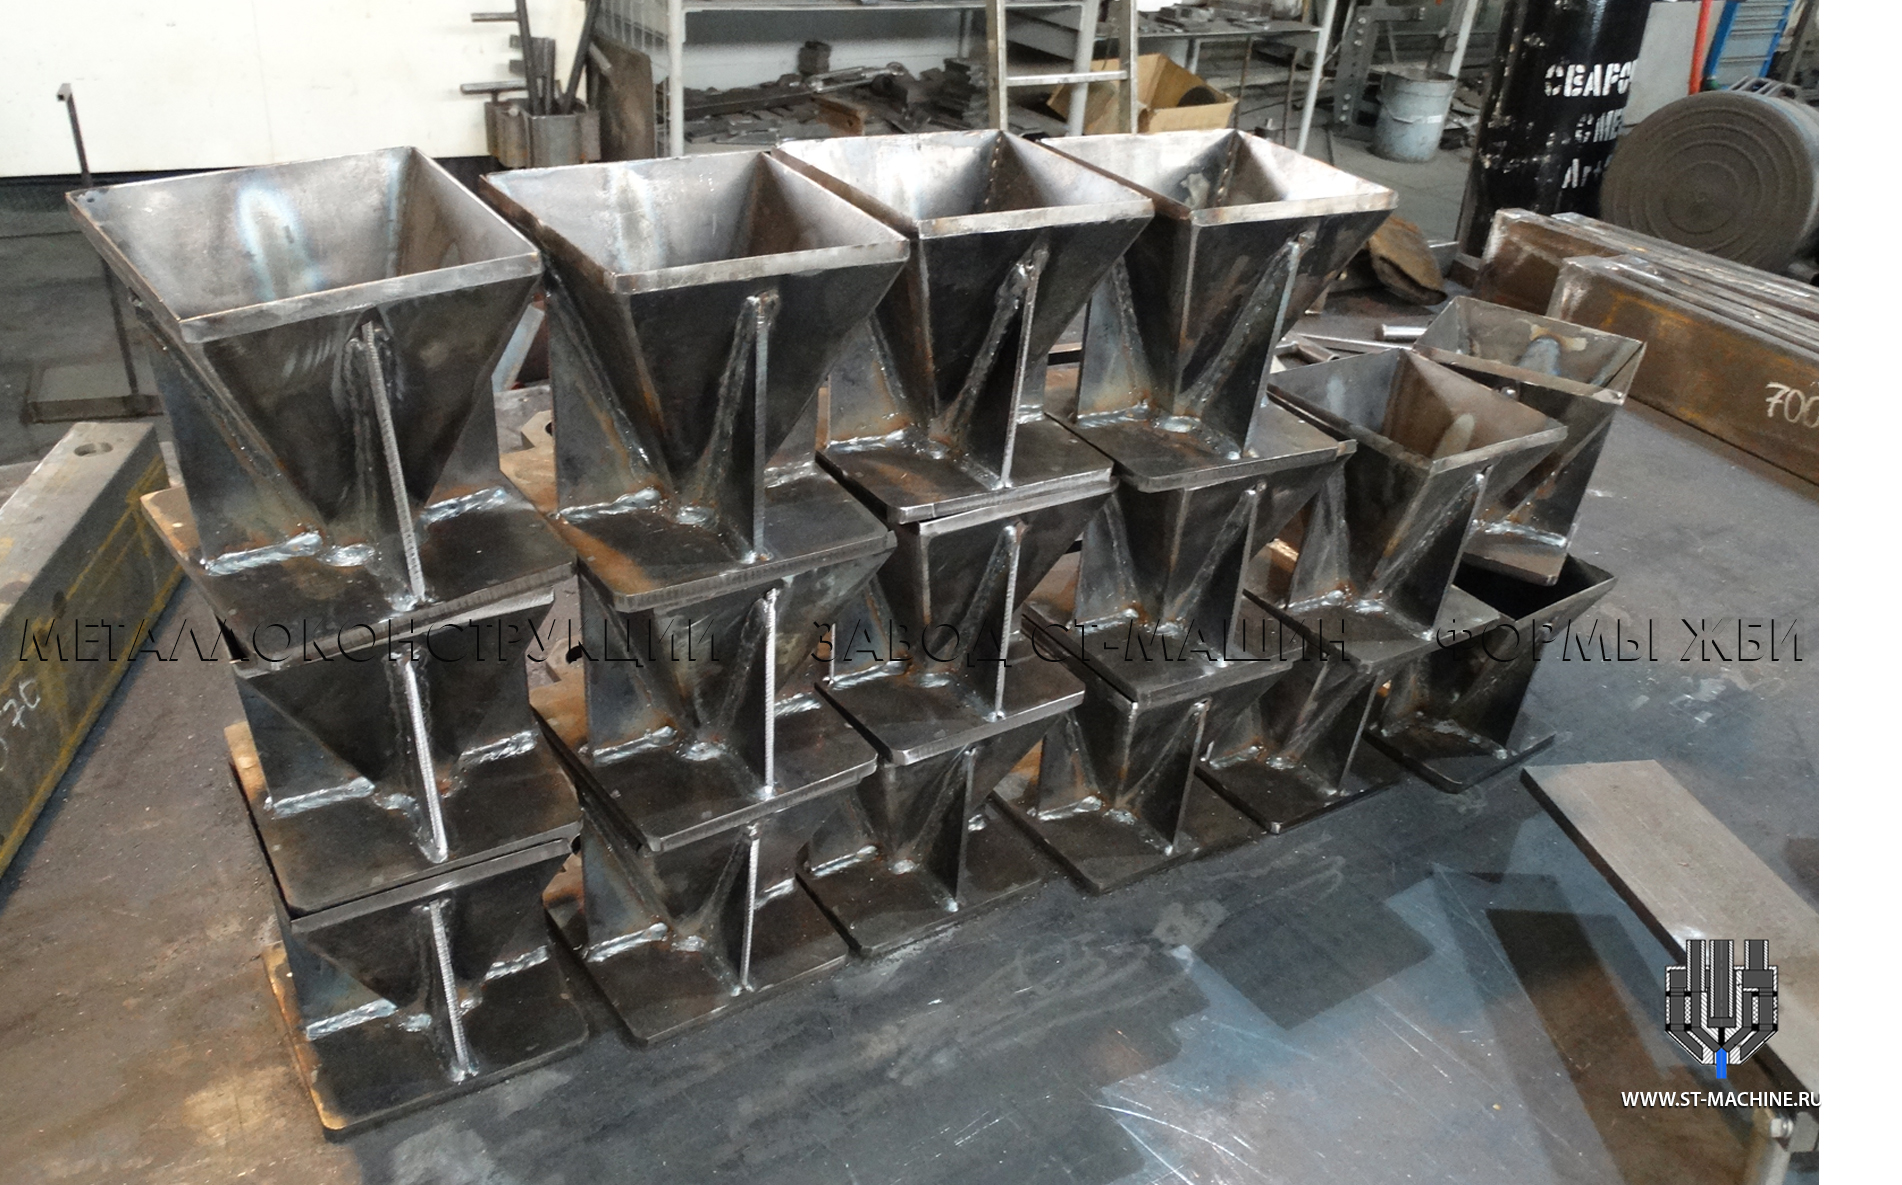 металлоизделия-на-заказ-формы-свай-200-200-8ручьев-ст-машин-st-machine.ru-москва-балашиха.jpg